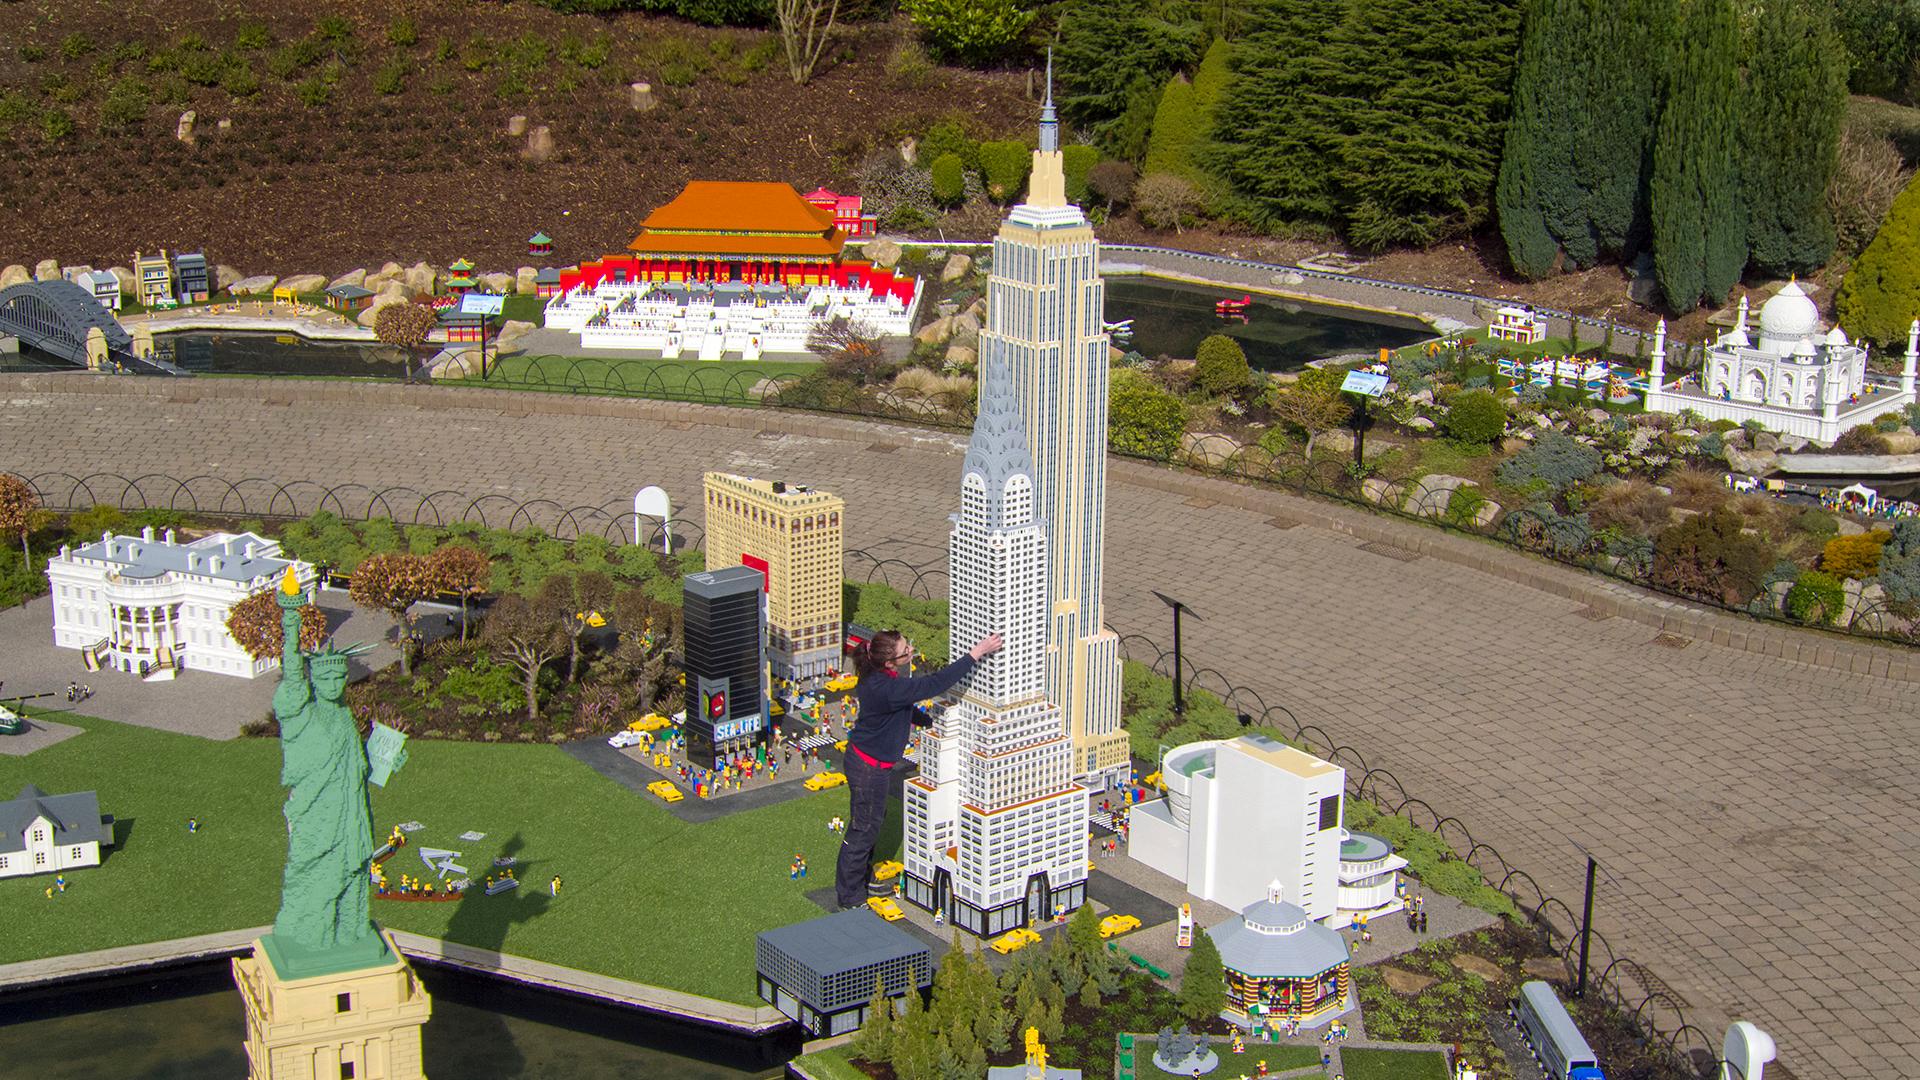 Miniland – Legoland Windsor Resort